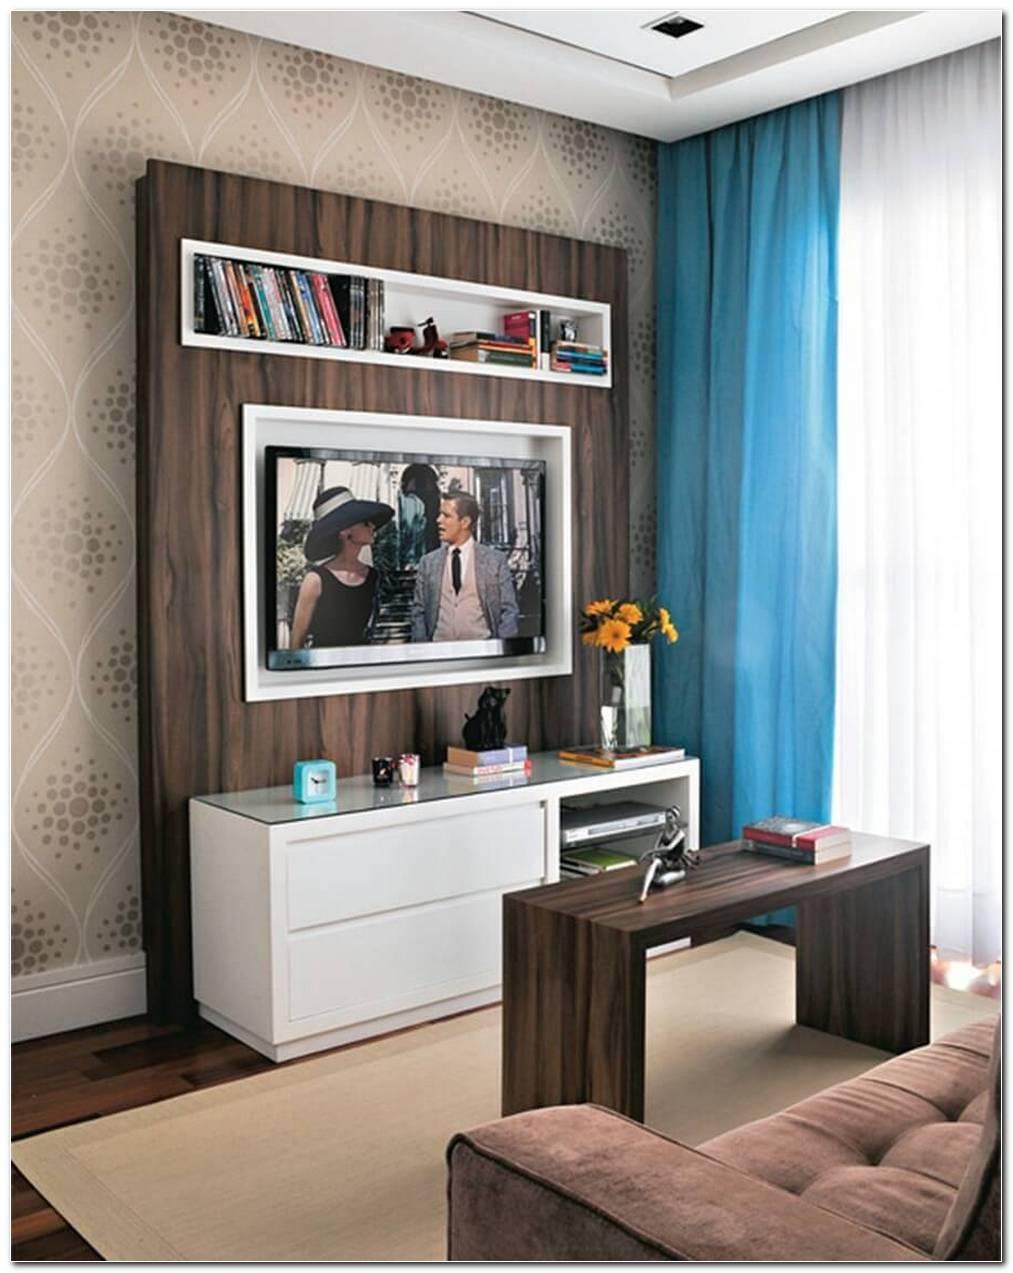 Fotos De Sala De Estar Simples E Pequena